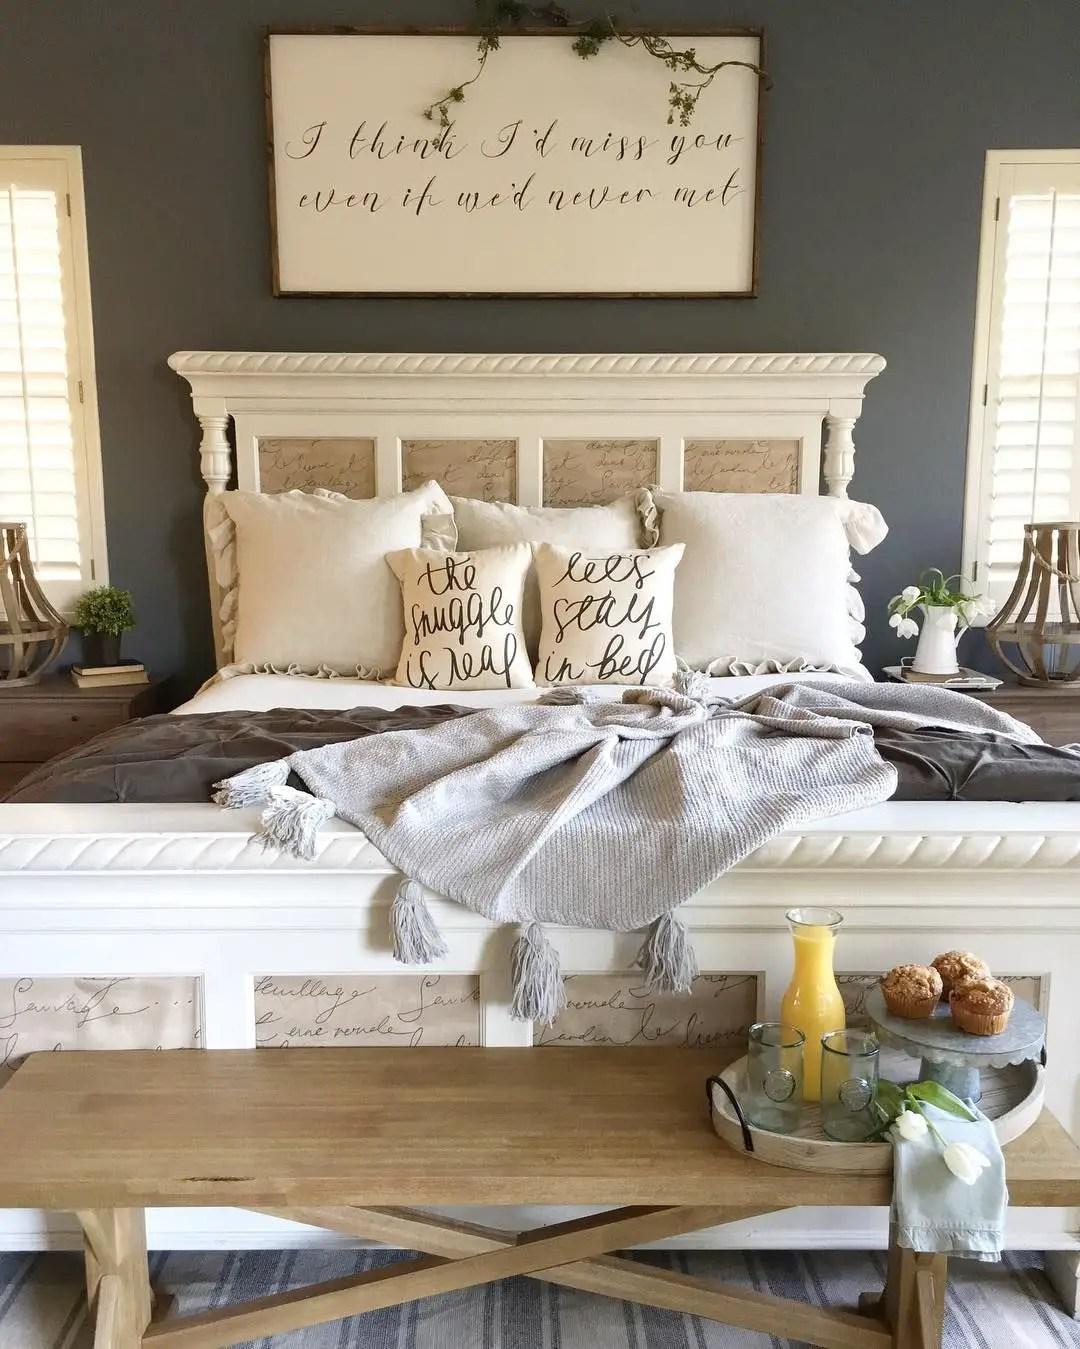 Farmhouse Bedroom: 50 Farmhouse Bedroom Design Ideas That Inspire